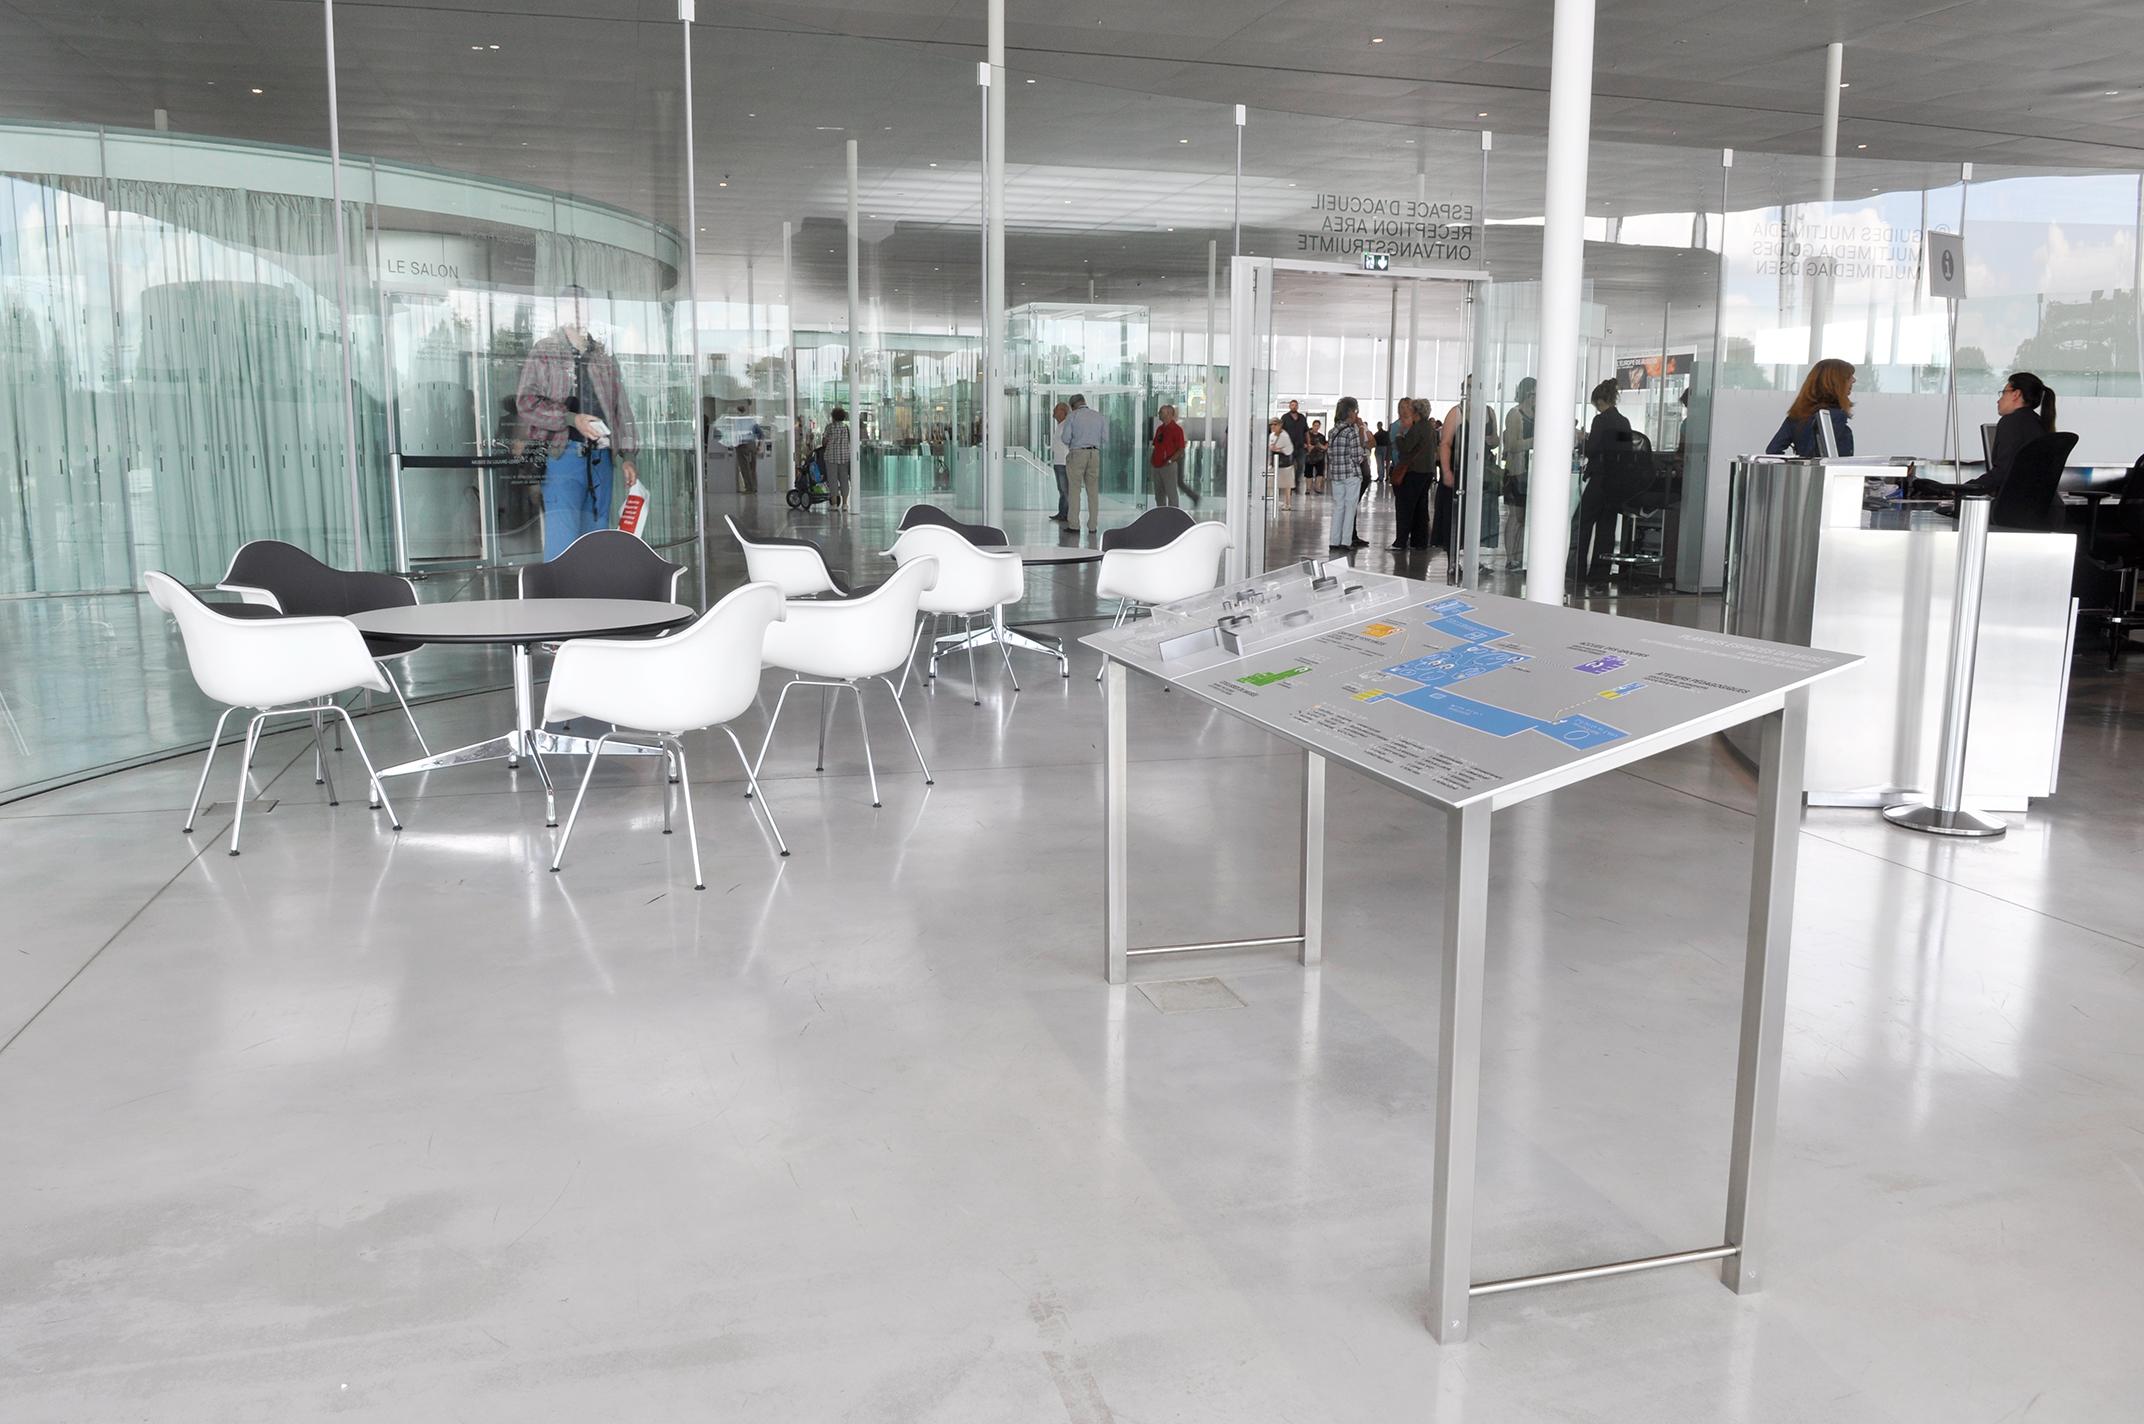 Plan en relief, Louvre Lens